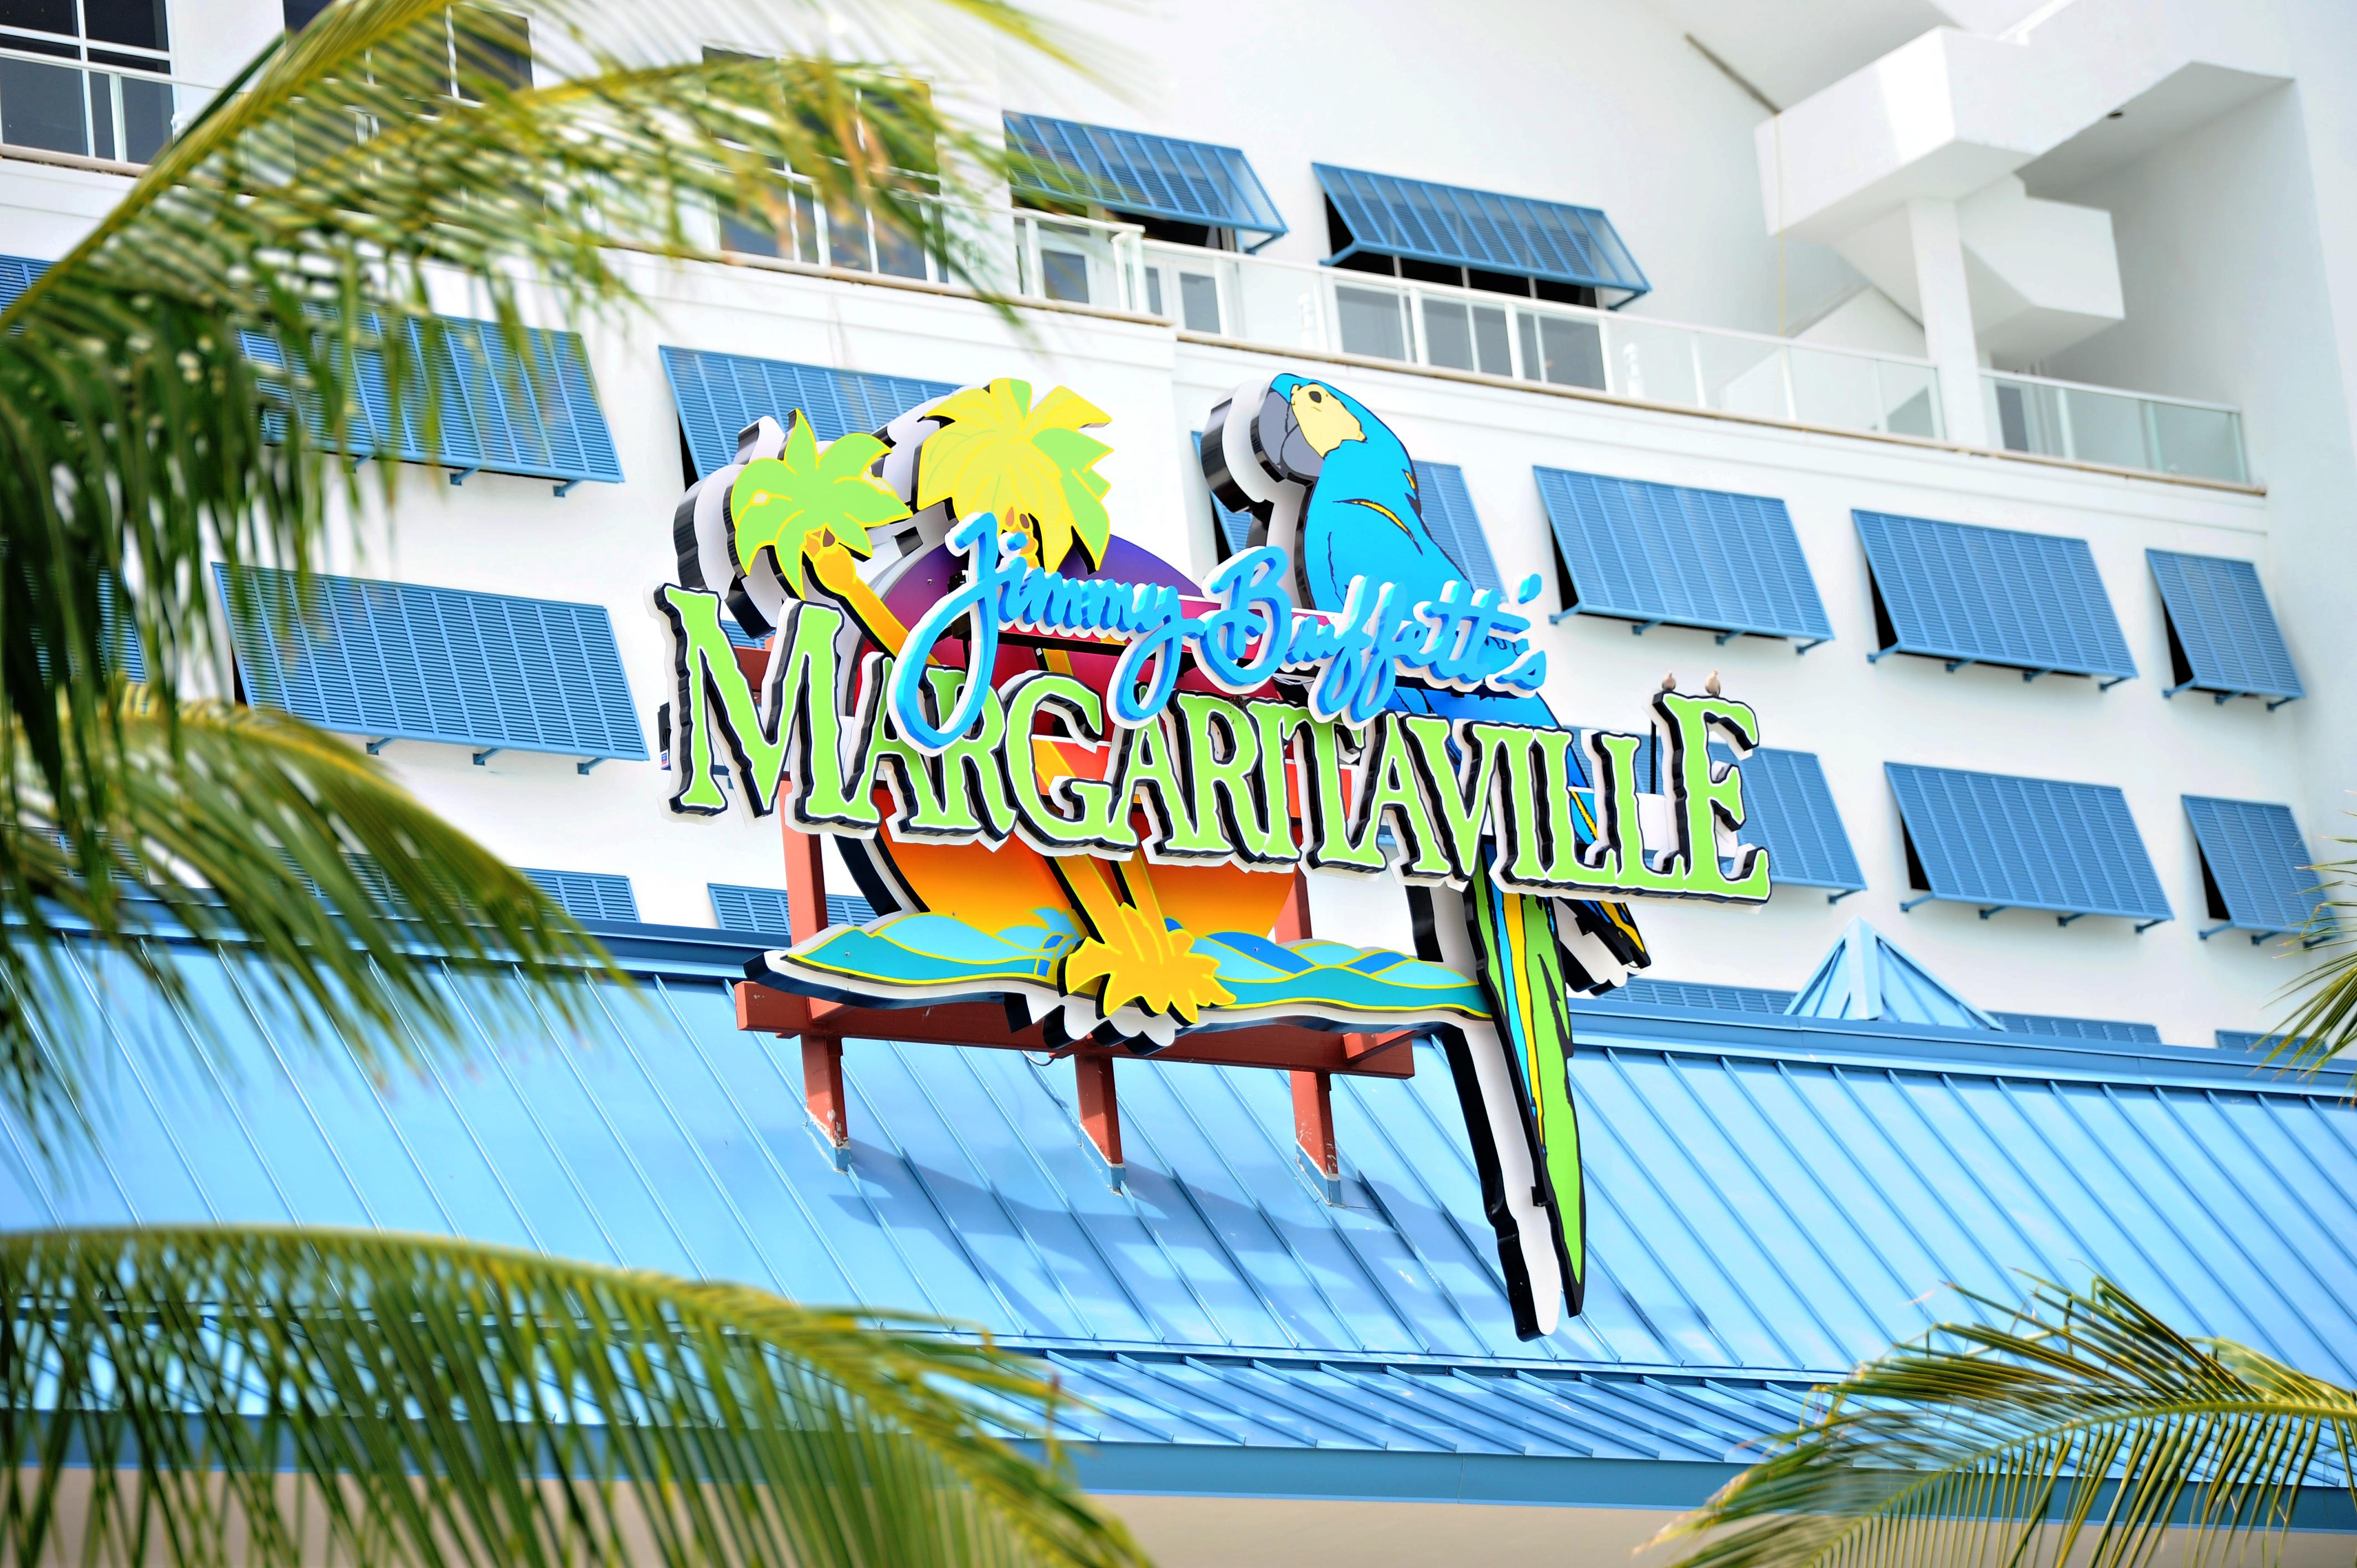 Margaritaville-Hollywood-Beach-Florida-Resort